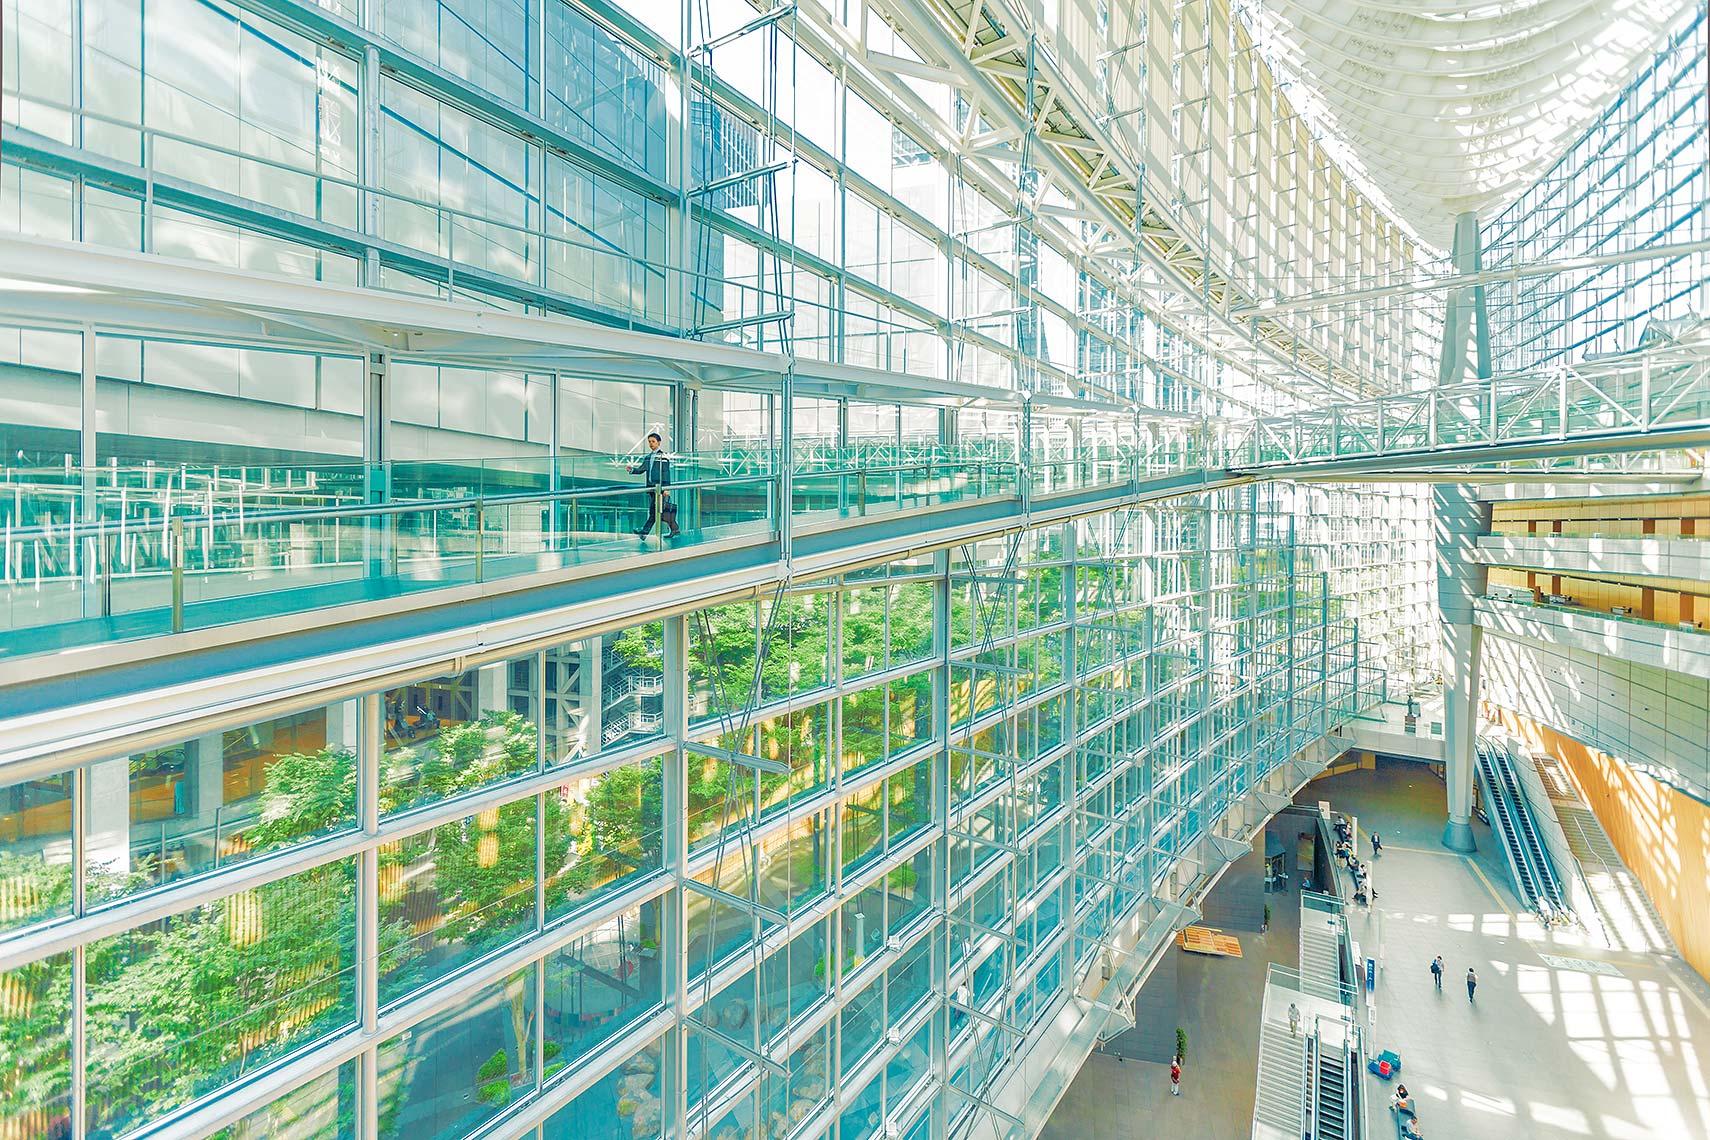 Tokyo_GlassBridge2_V1.jpg